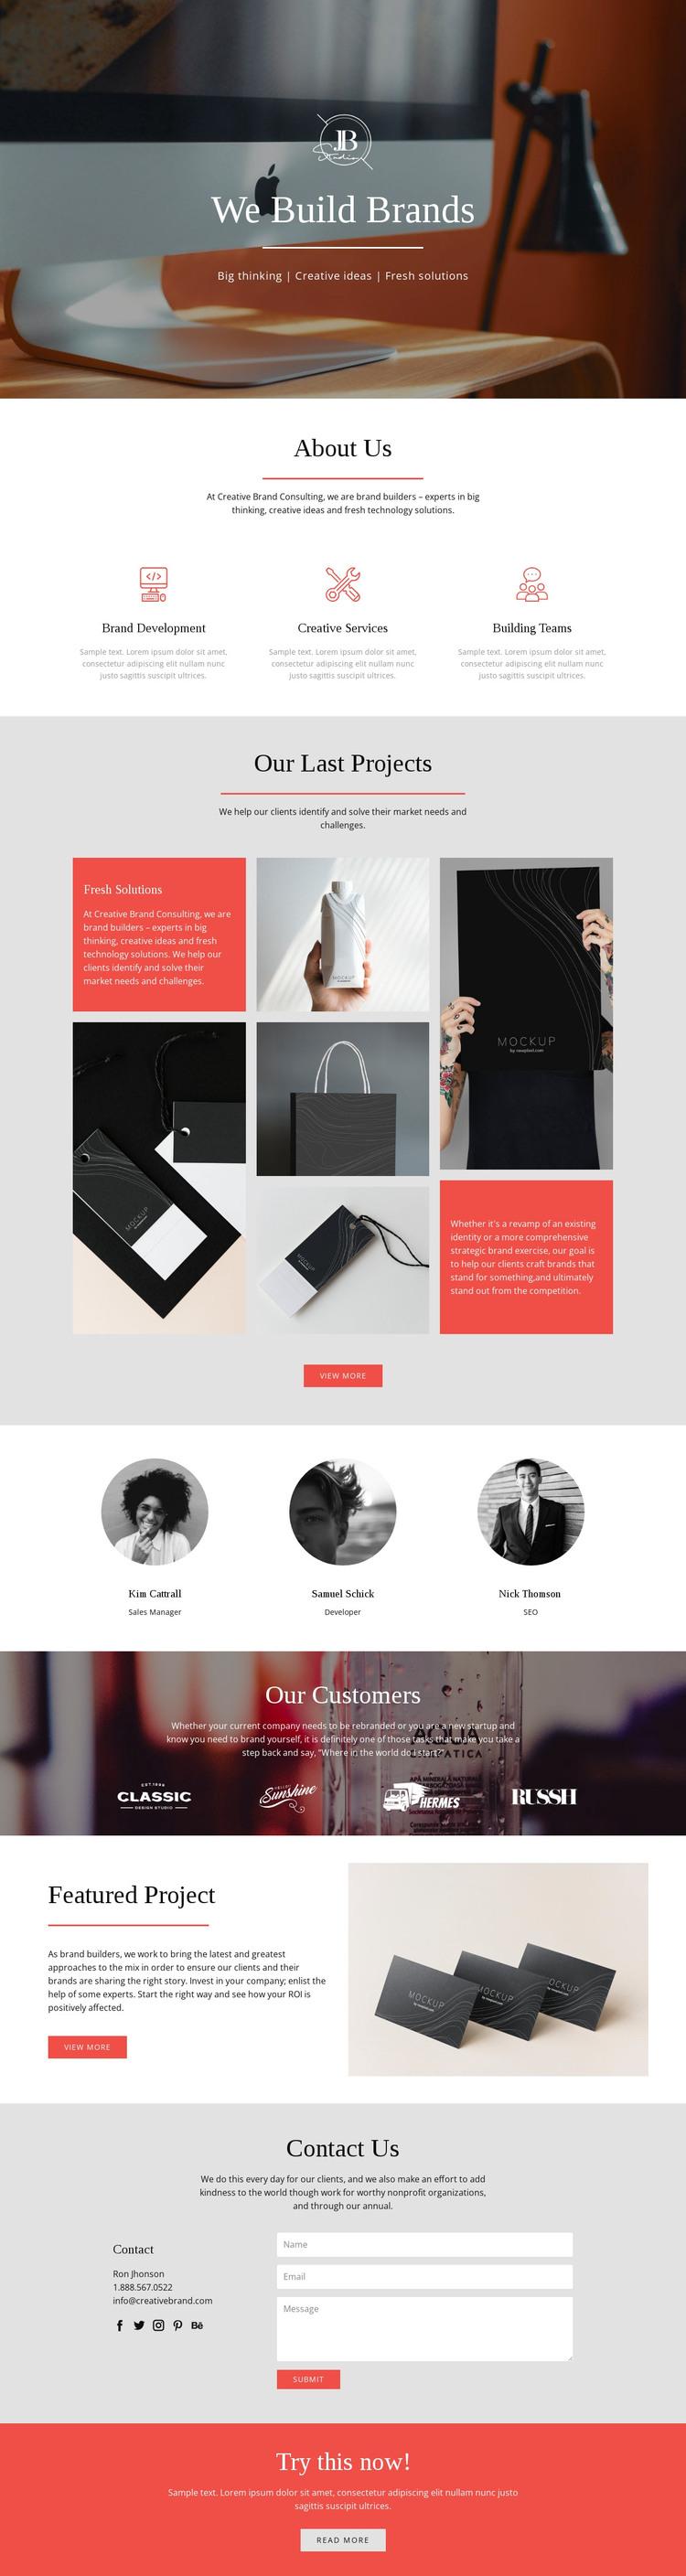 We build brands Web Design